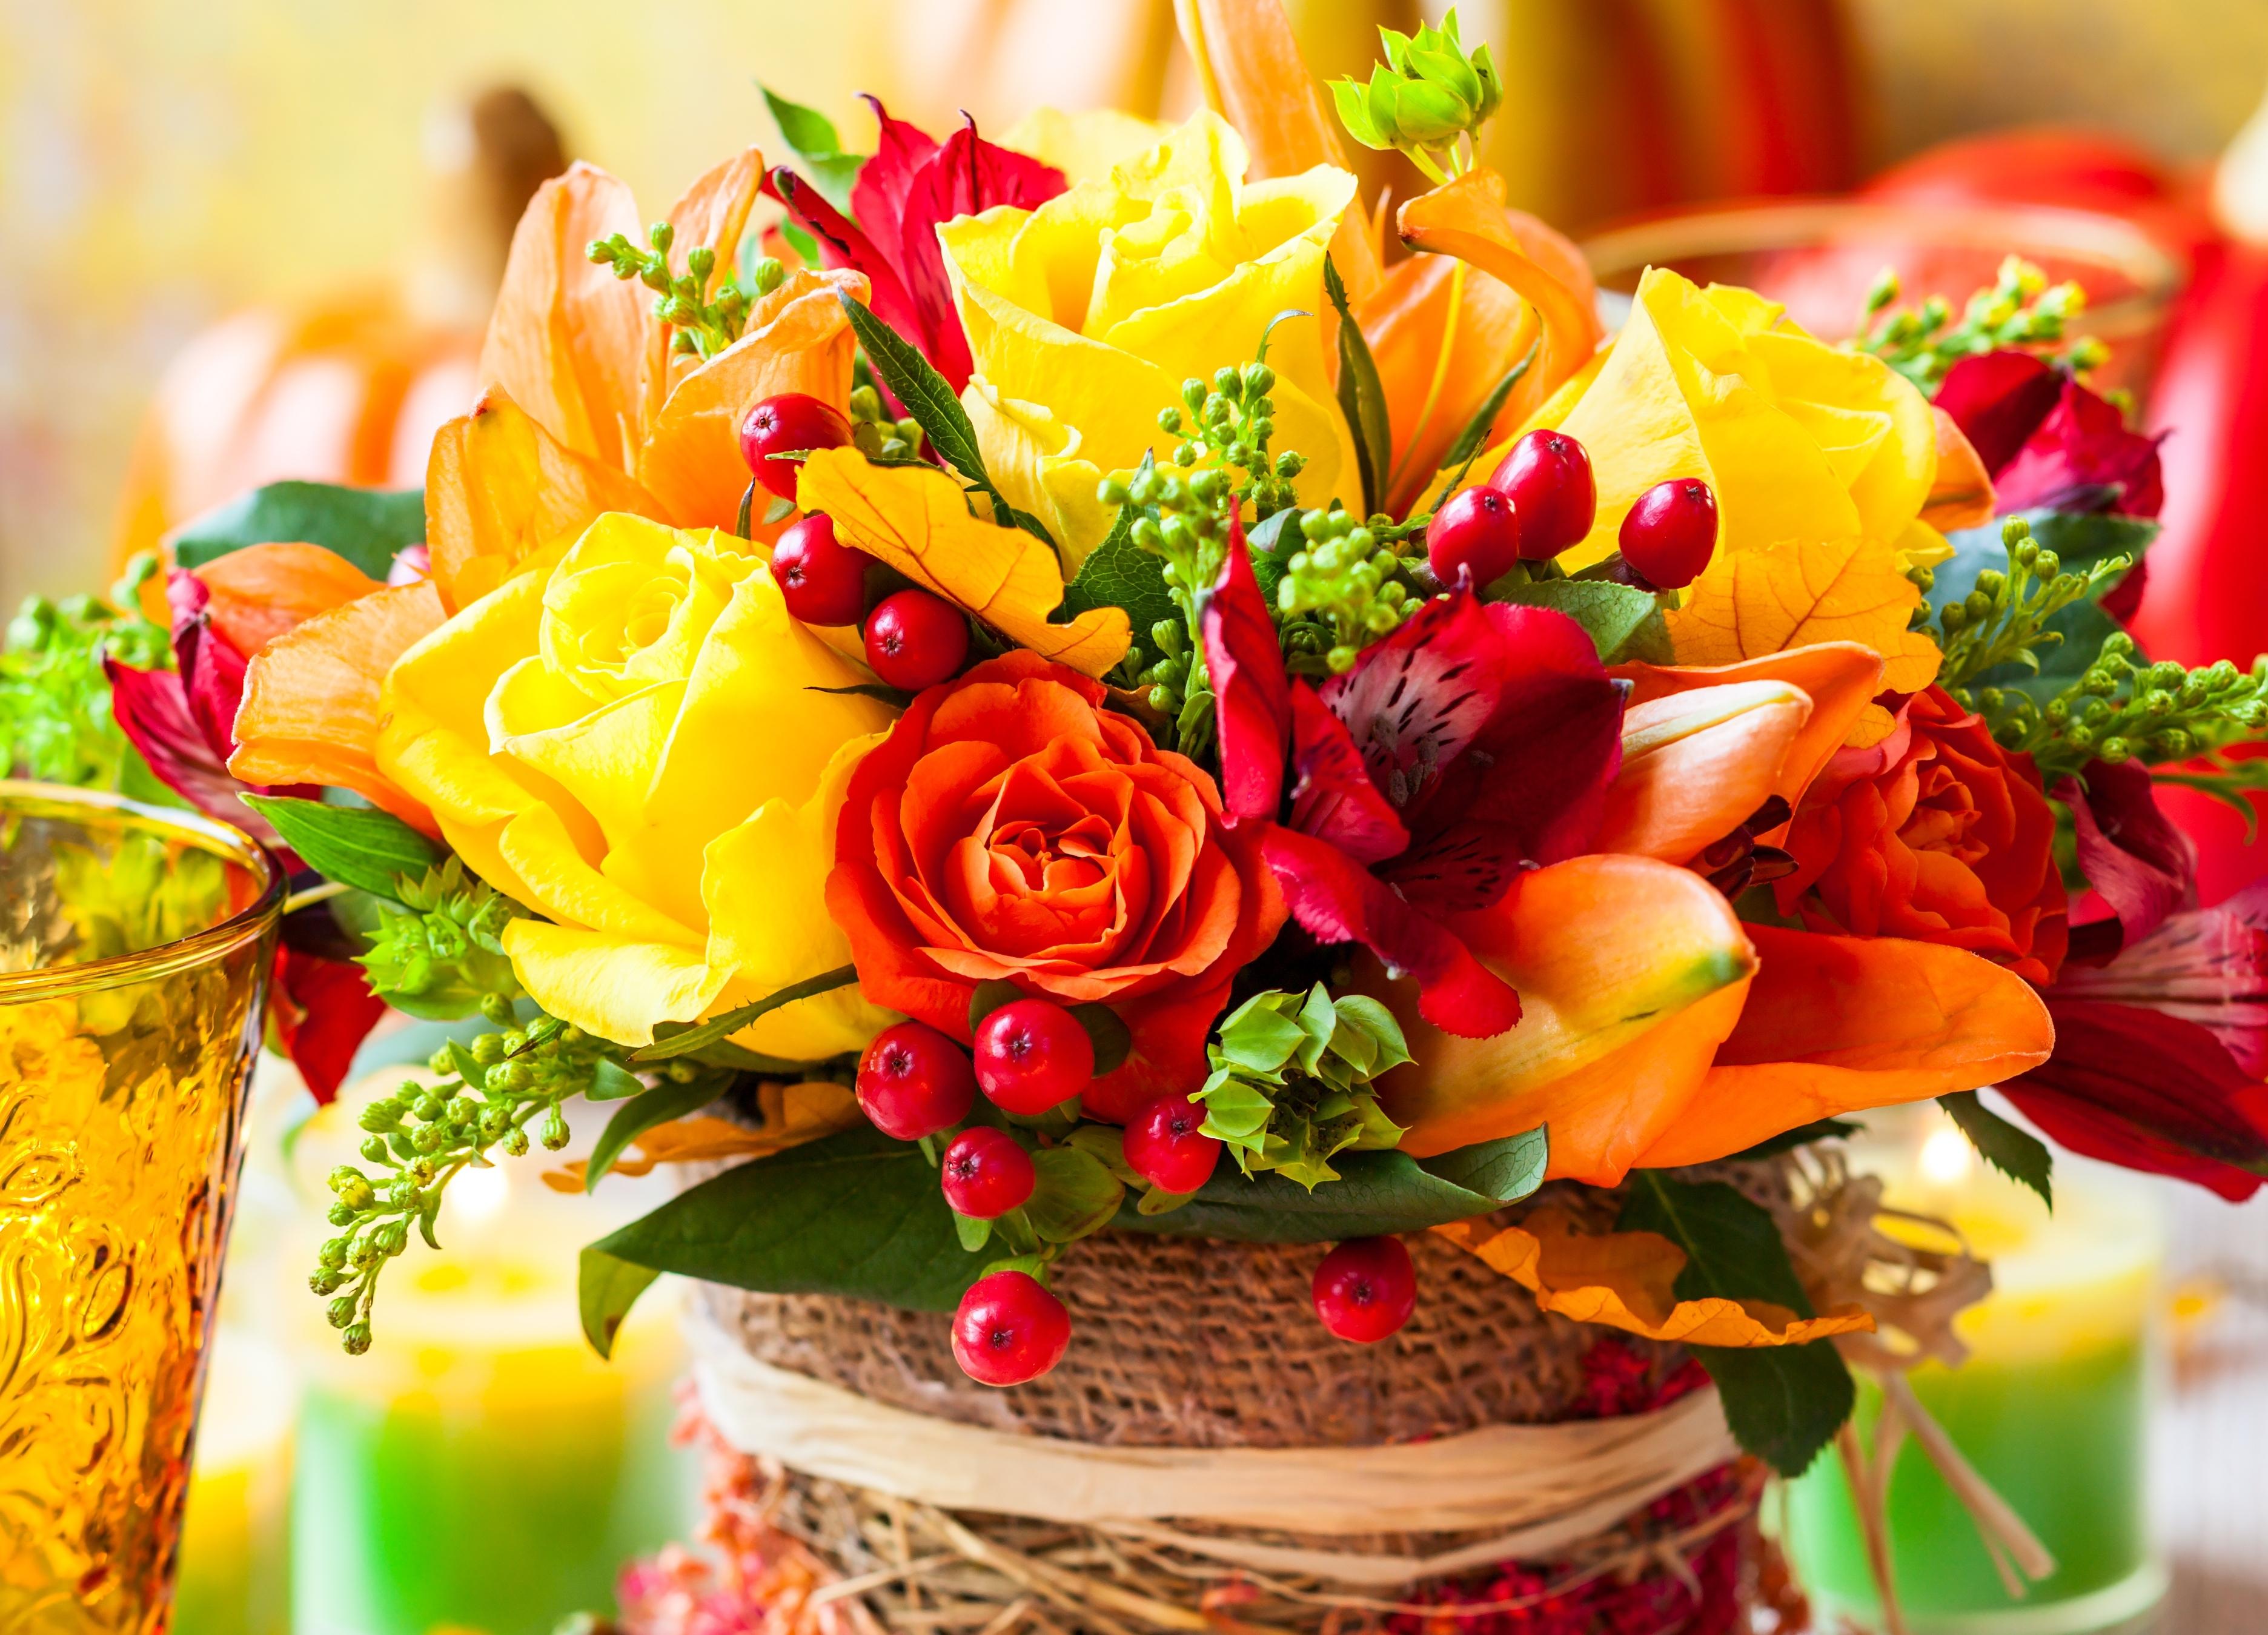 http://img3.goodfon.ru/original/3744x2699/7/bb/buket-cvety-rozy-yagody.jpg